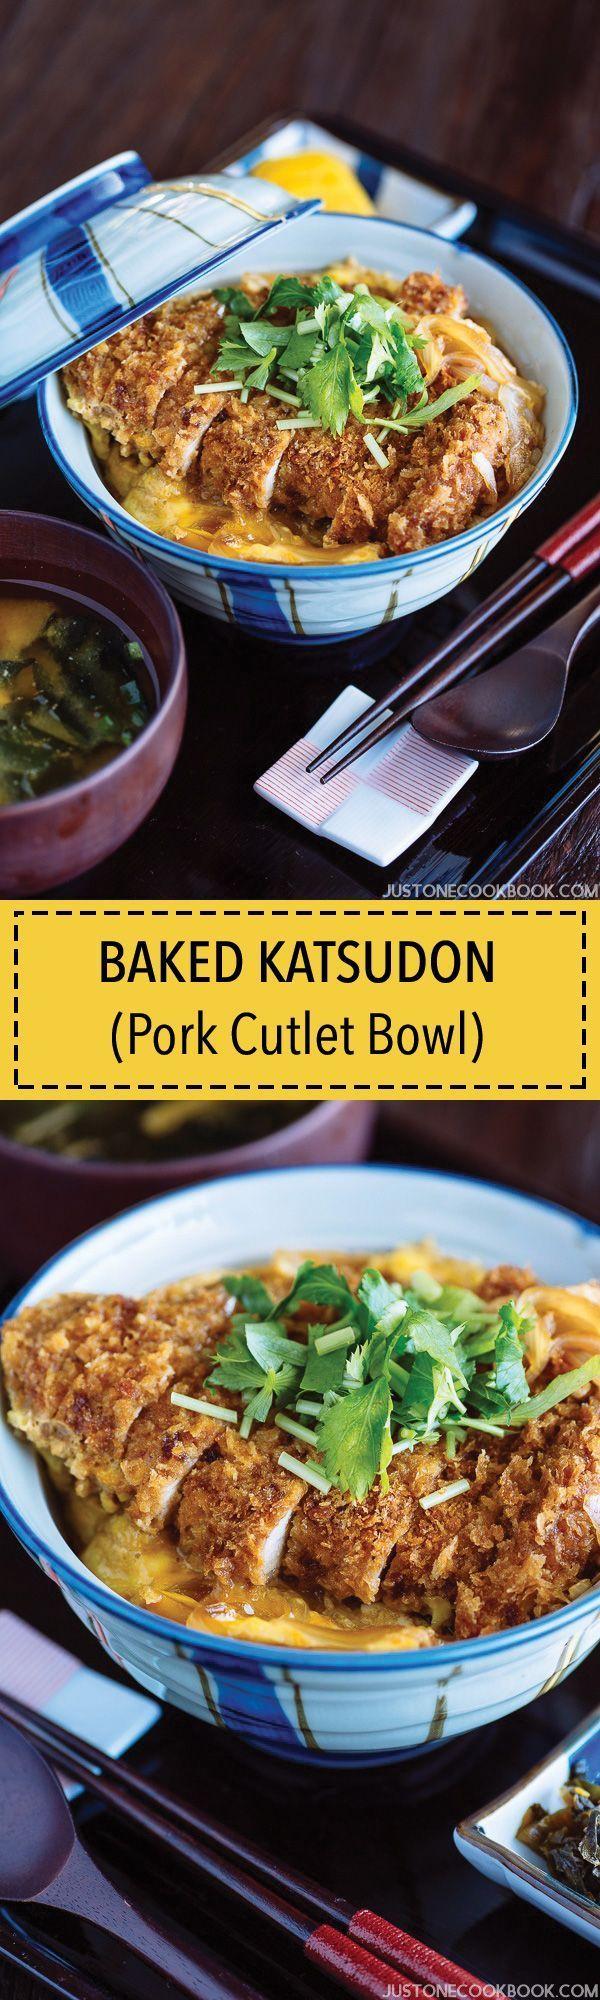 Best 25 easy japanese recipes ideas on pinterest japanese baked katsudon easy japanese recipes at justonecookbook forumfinder Gallery